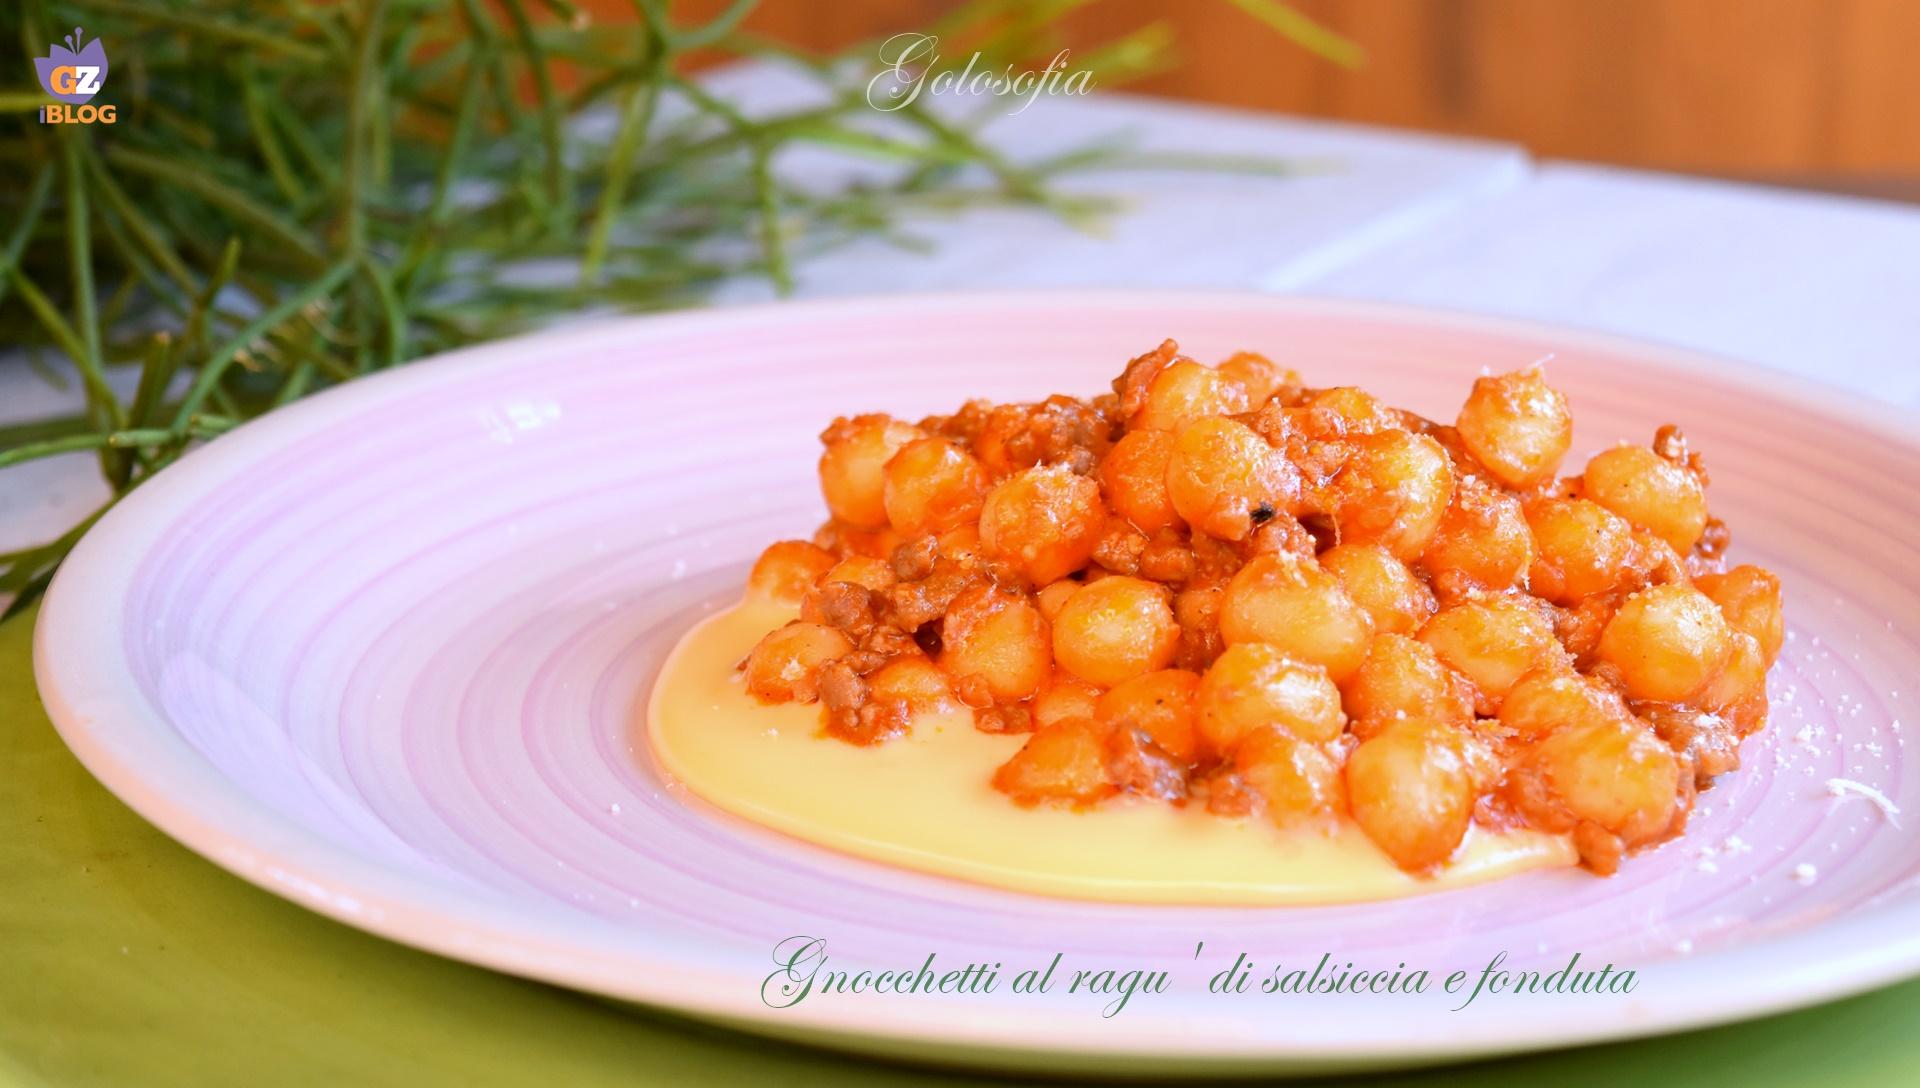 Gnocchetti al ragu' di salsiccia e fonduta, ricetta golosa